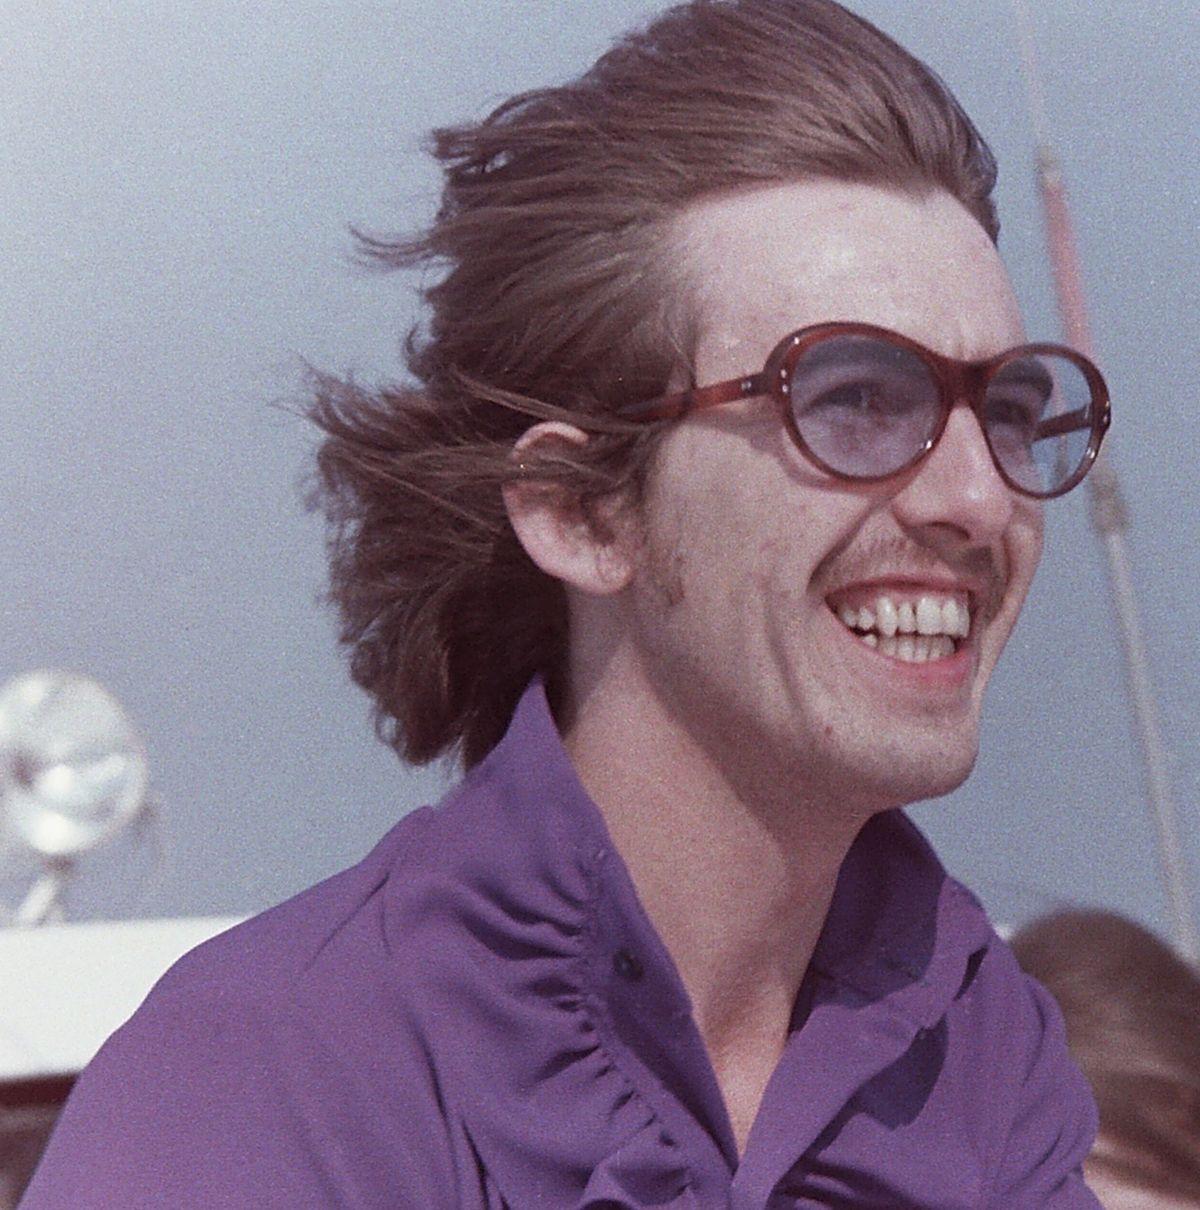 Beatle George Harrison 1968 Photo By Fellow Ringo Starr